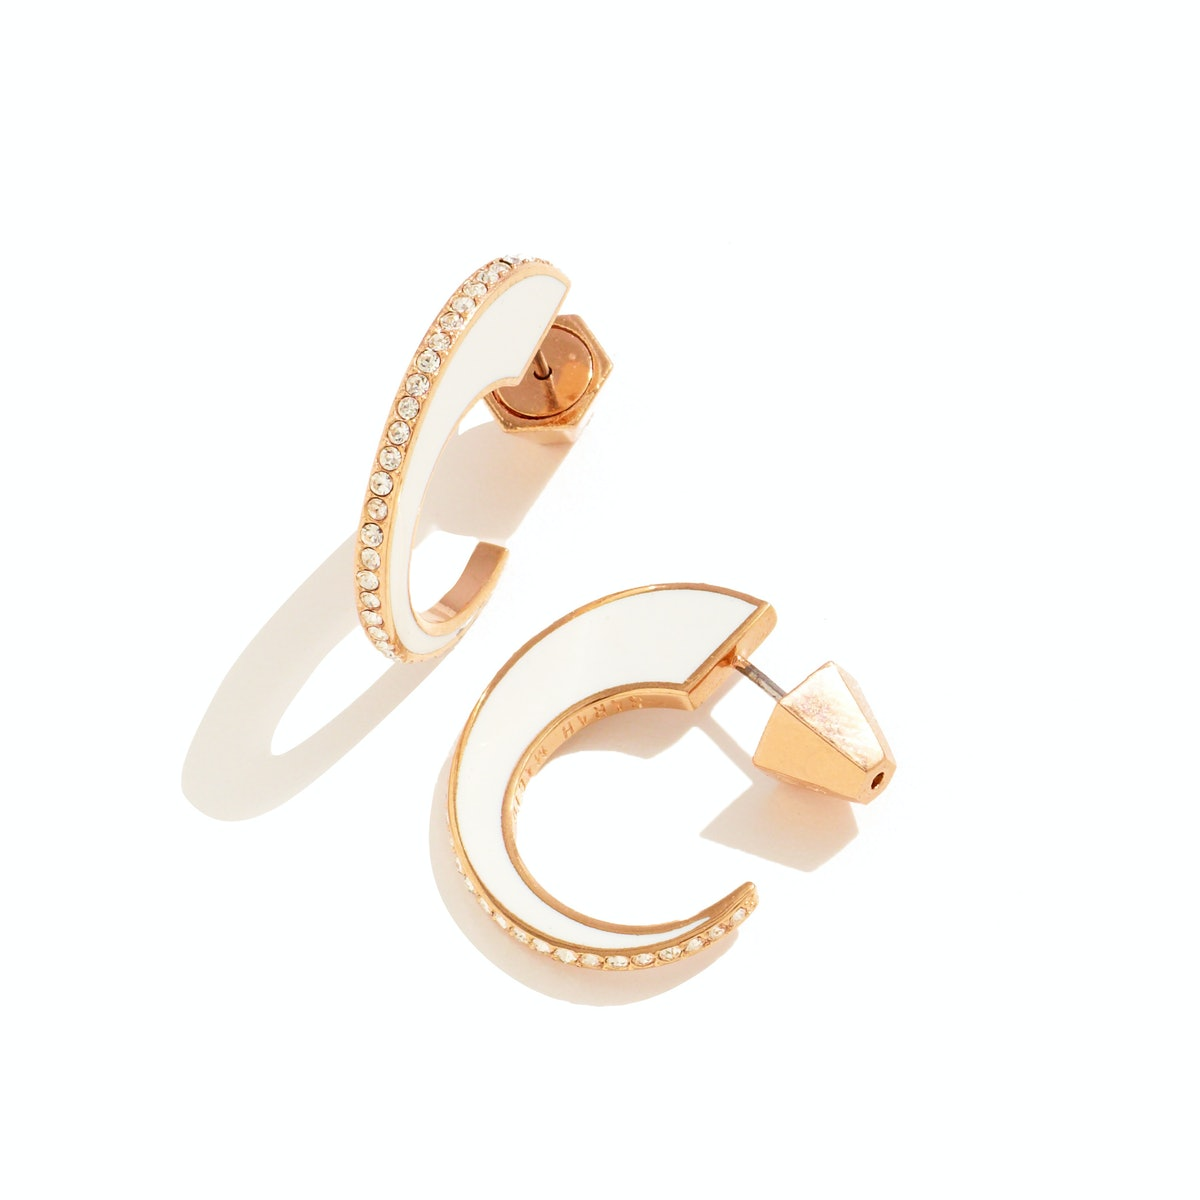 Sarah Magid earrings